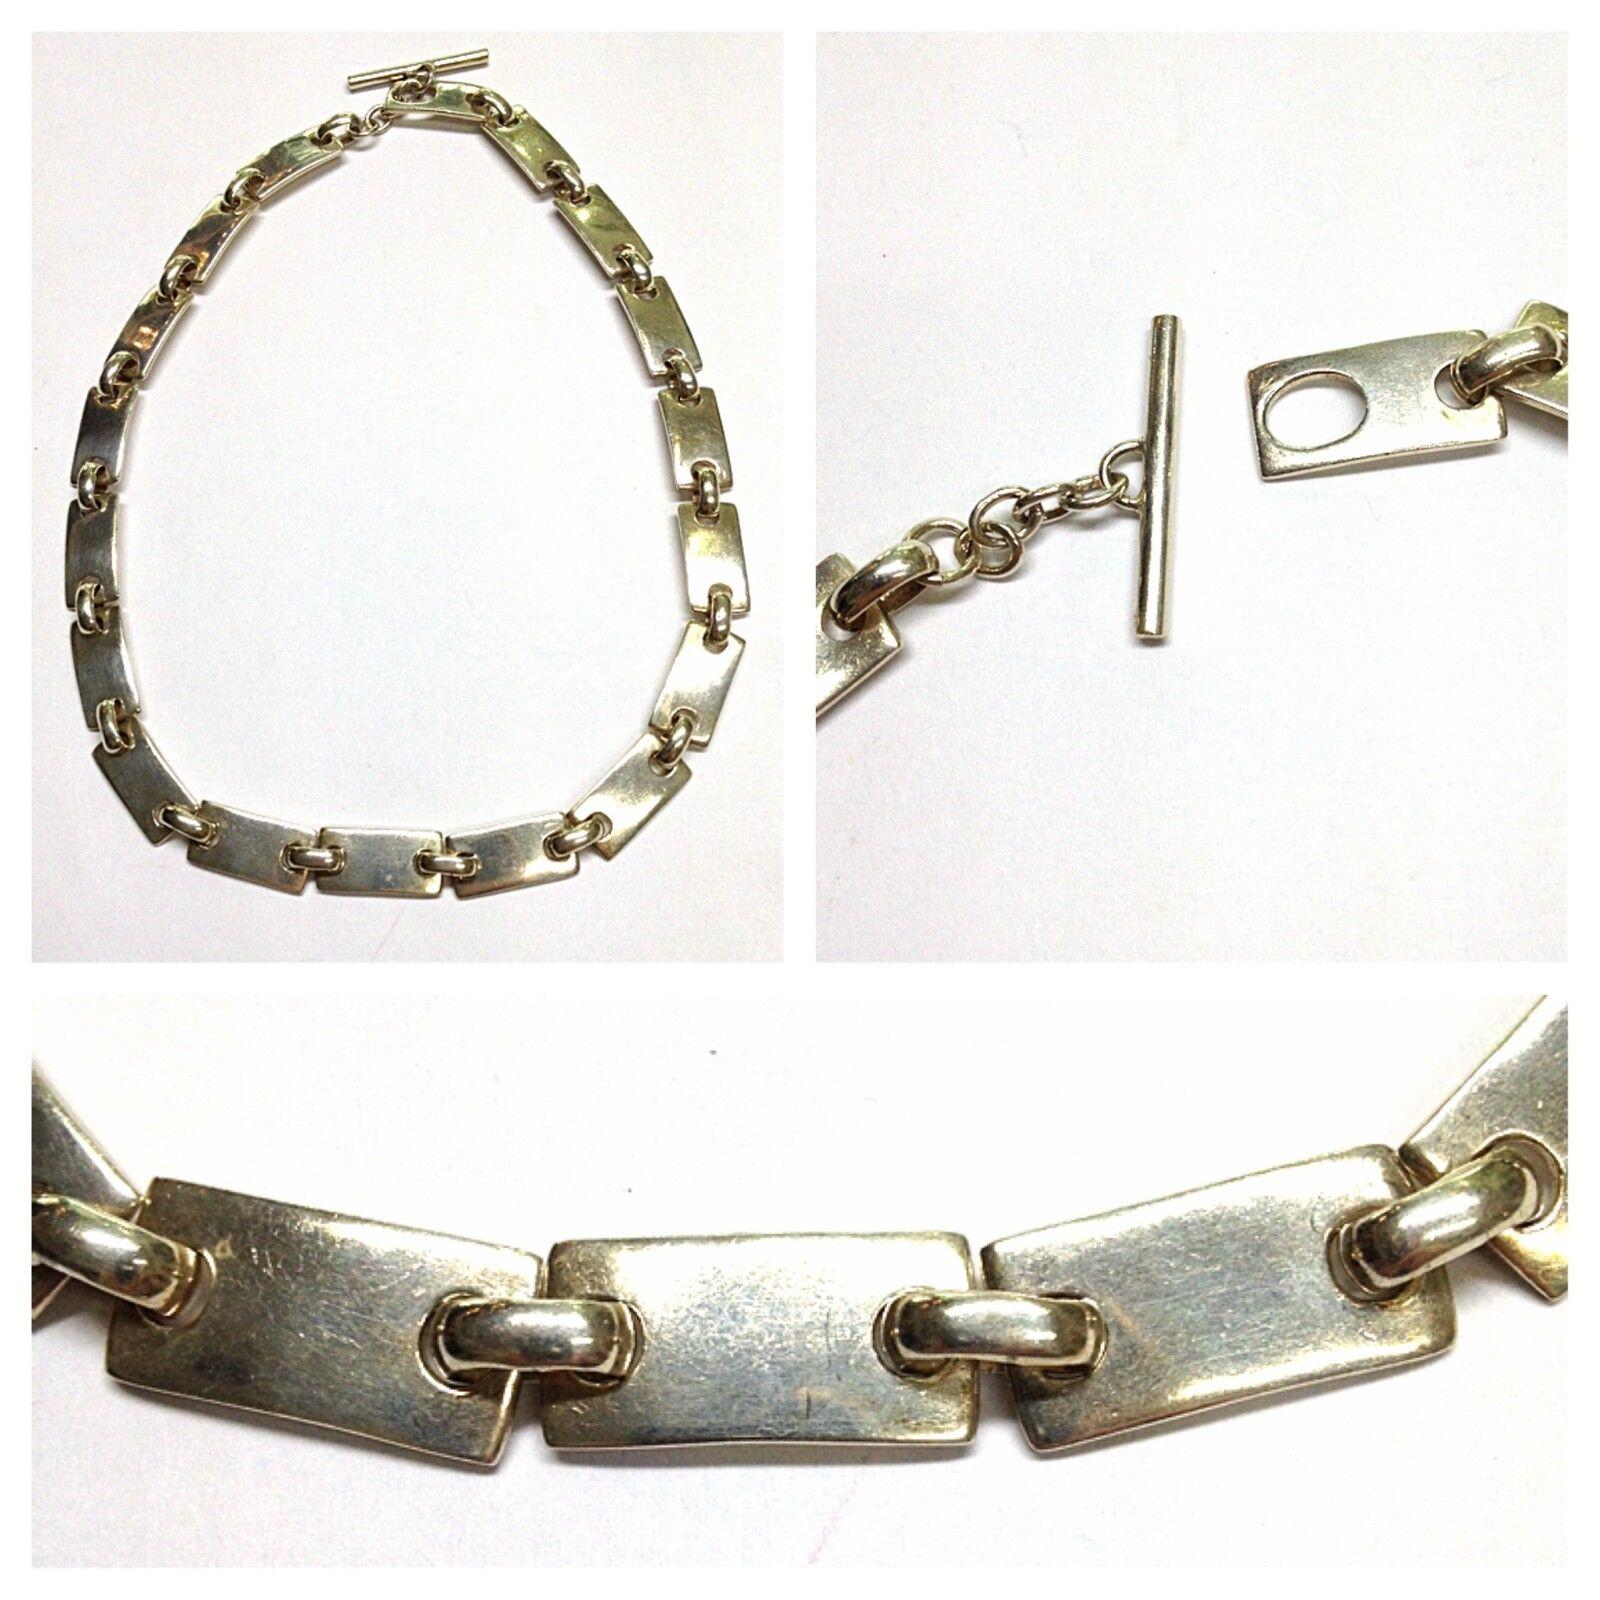 Collar 925 silver Cadena de silver collar de silver L  41cm Joyería silver